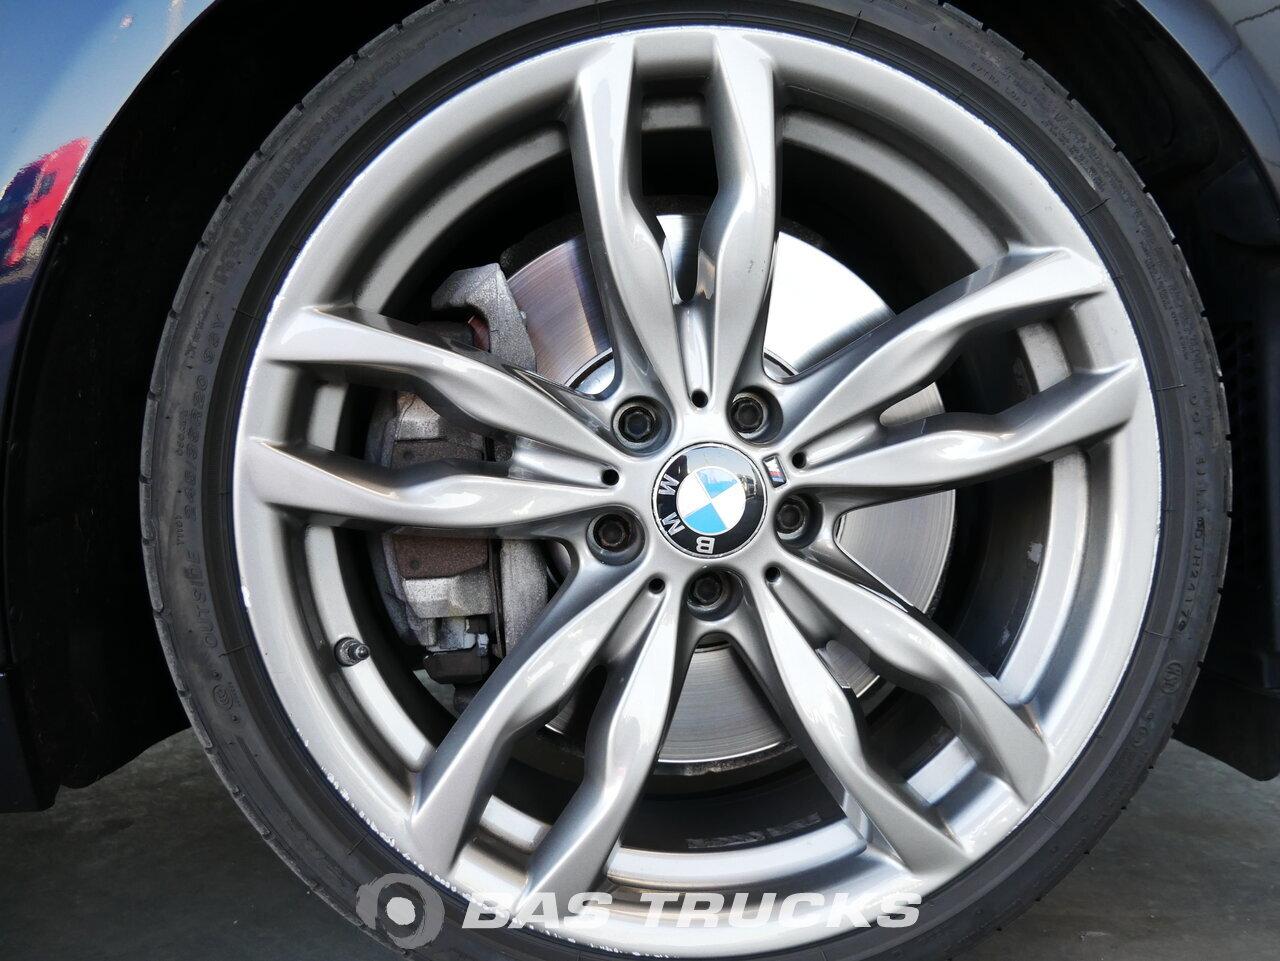 foto di Usato Macchina BMW 5-Serie Touring 2015